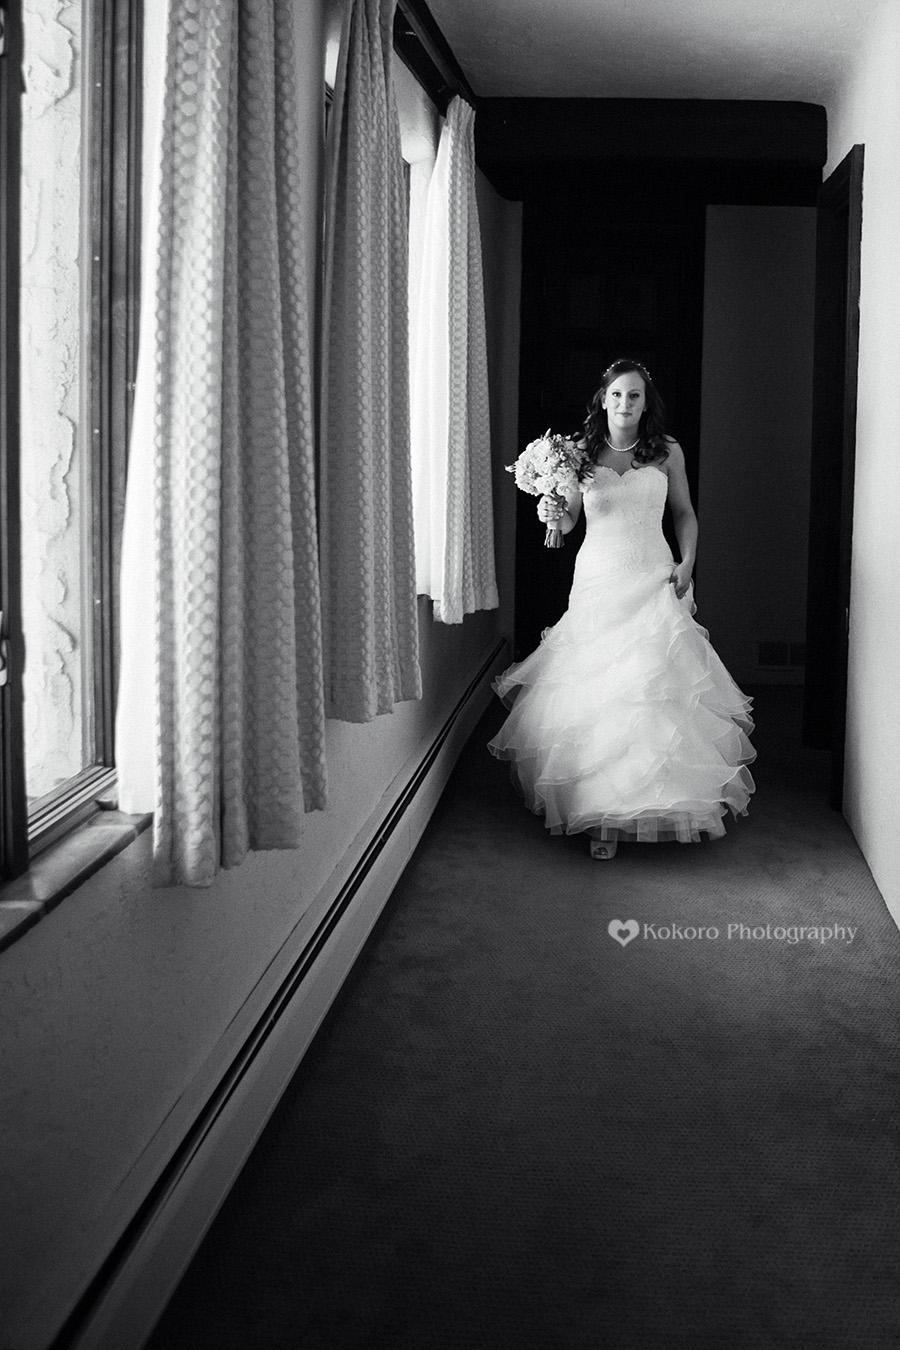 Colorado Wedding Photography